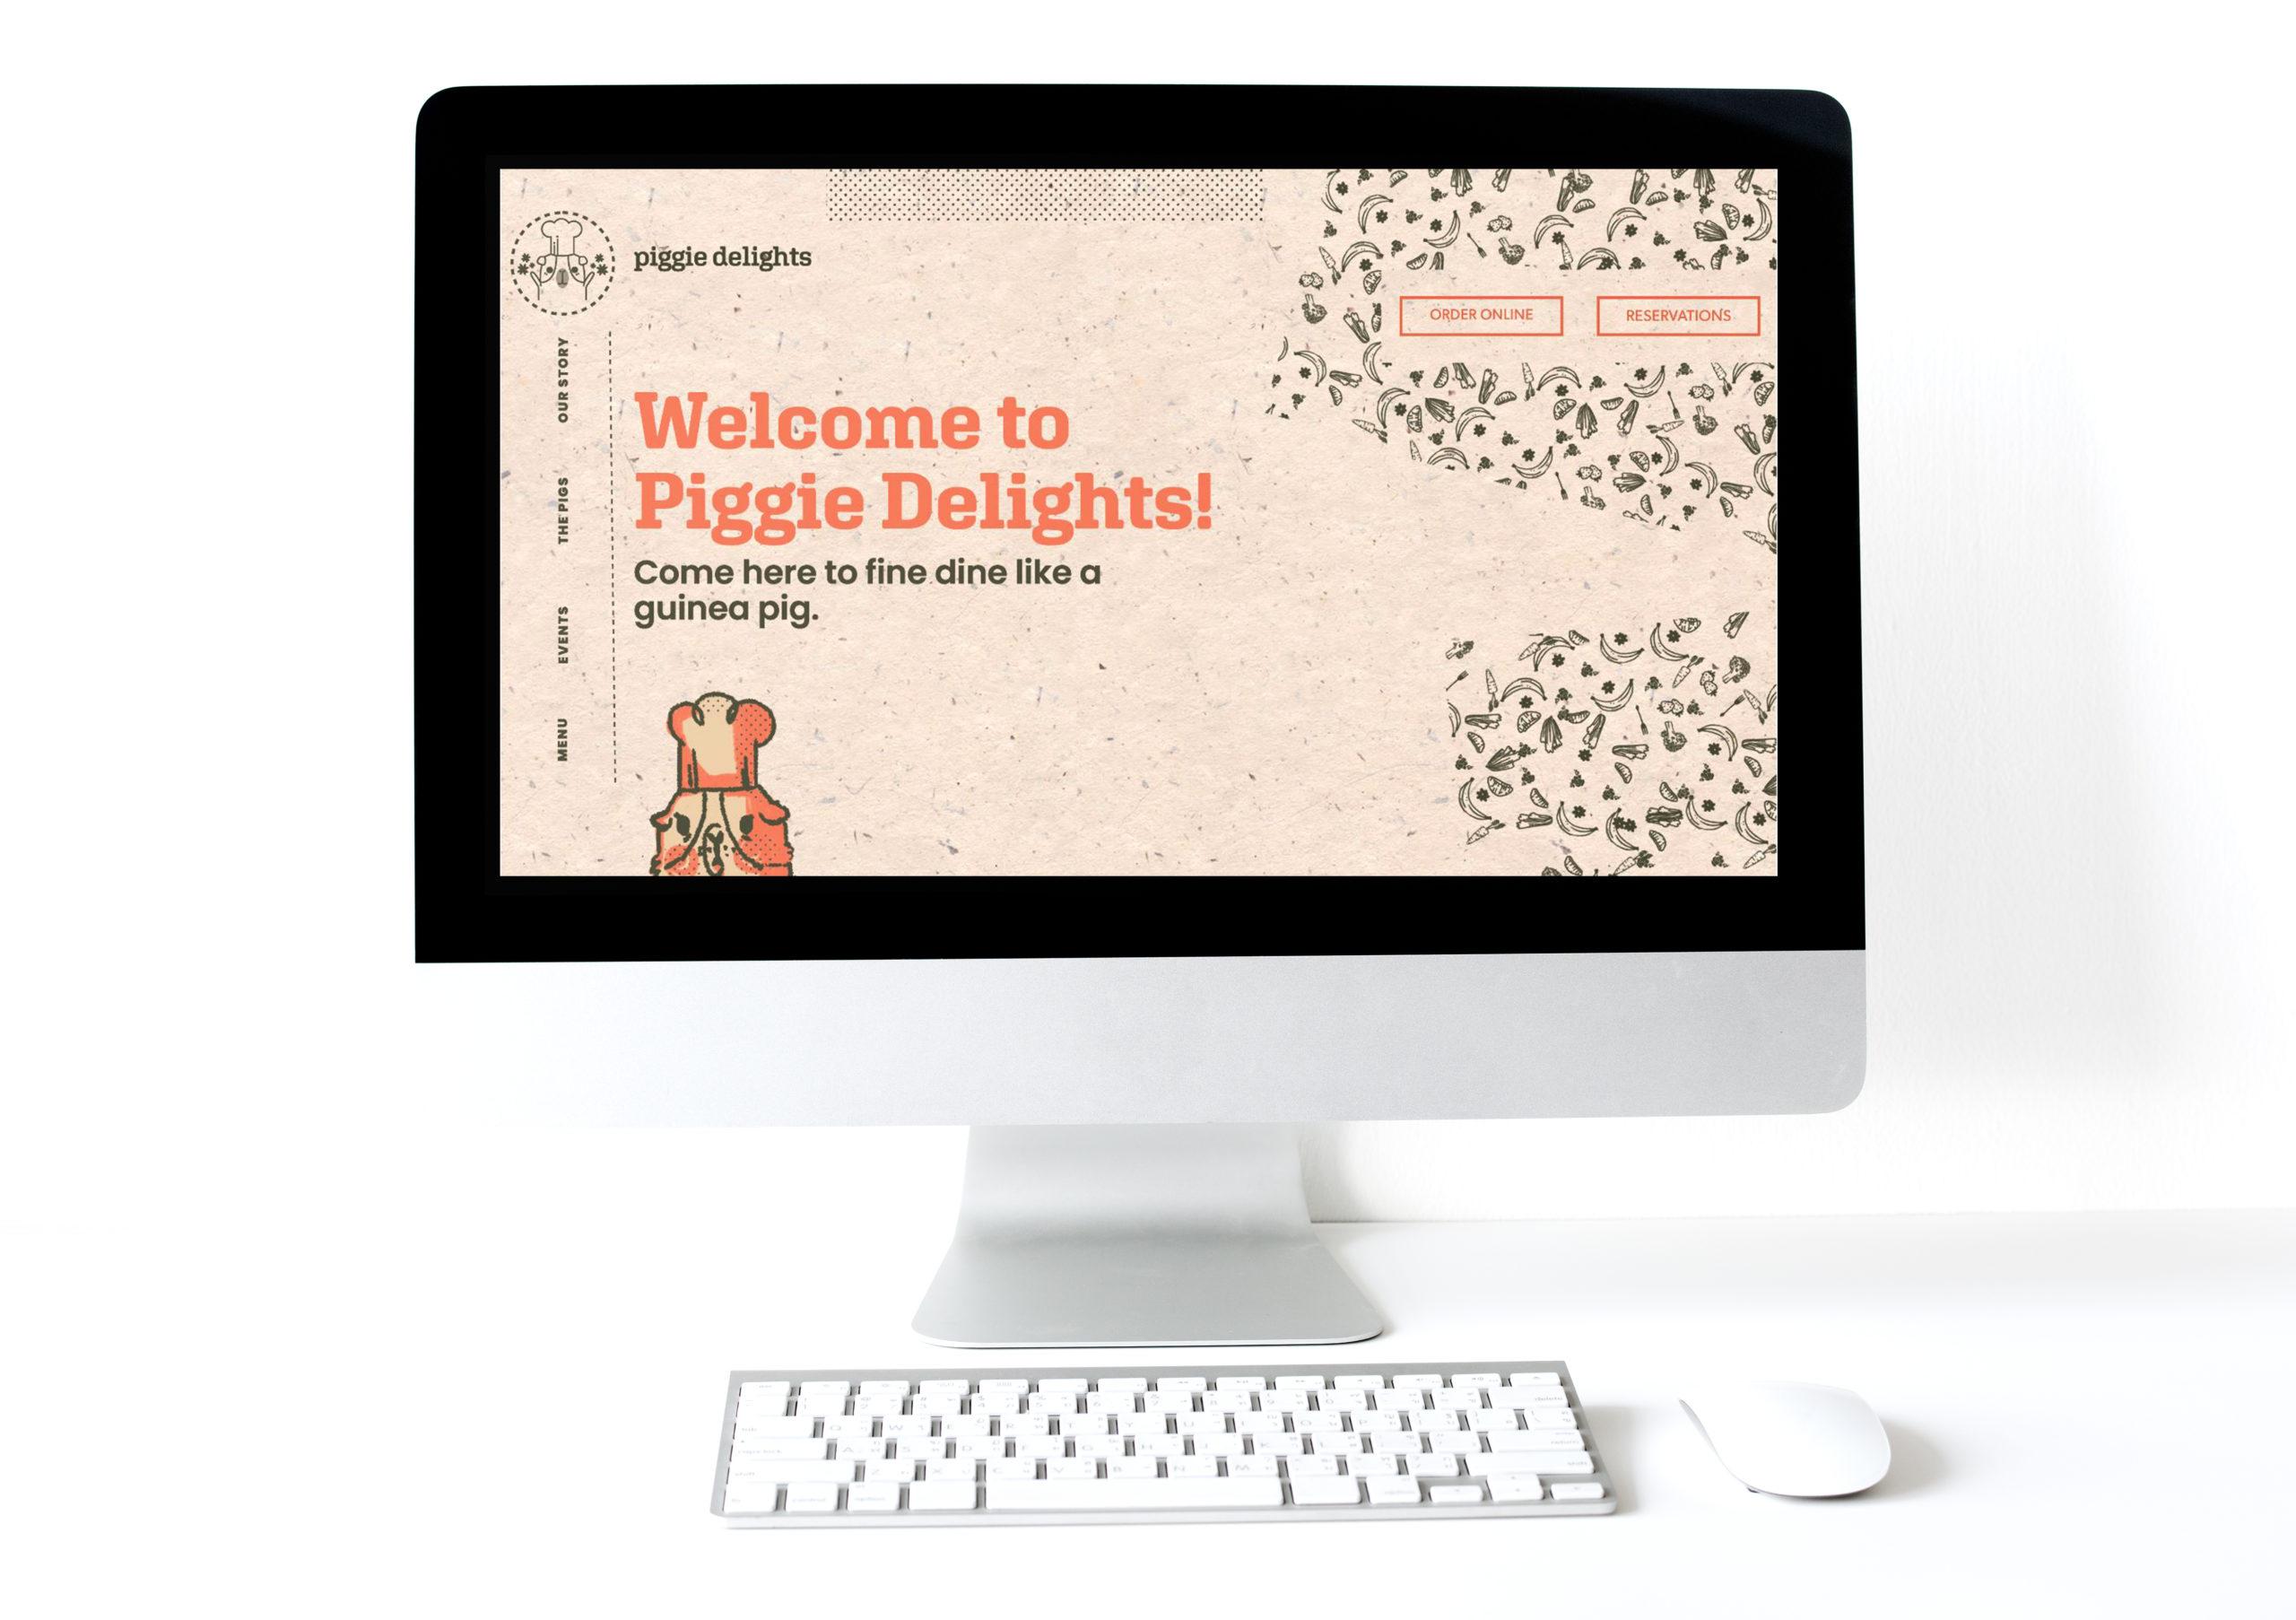 Piggie Delights